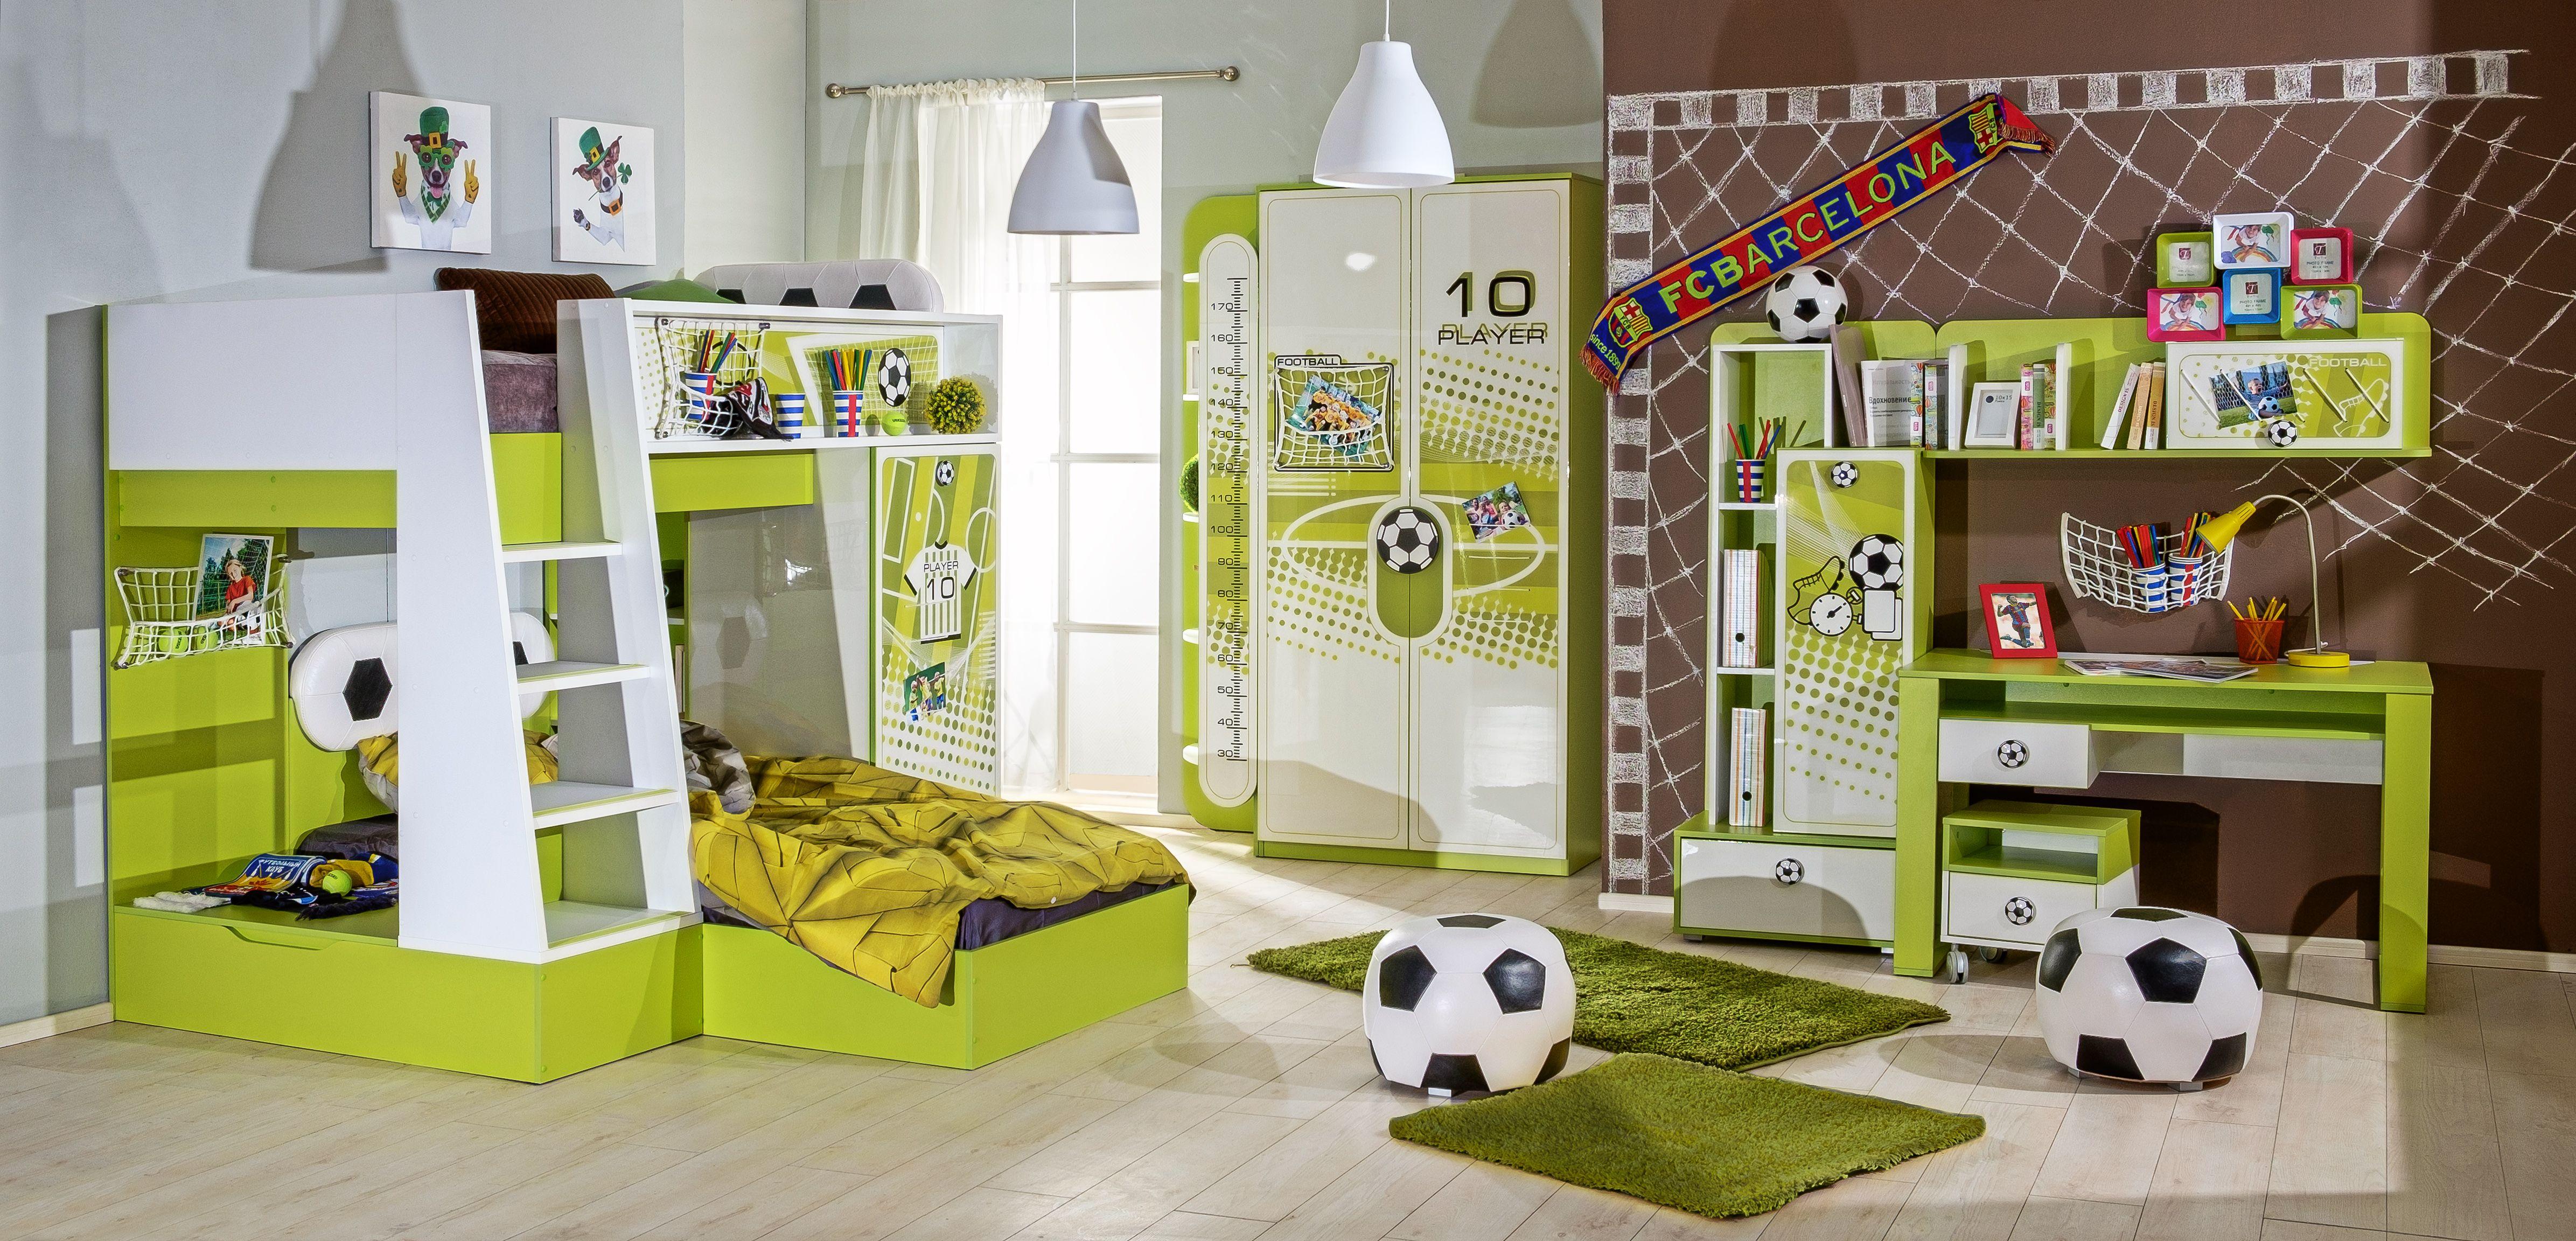 Kinderzimmer Fussball In Grun Weiss Etagenbett 8 Teilig